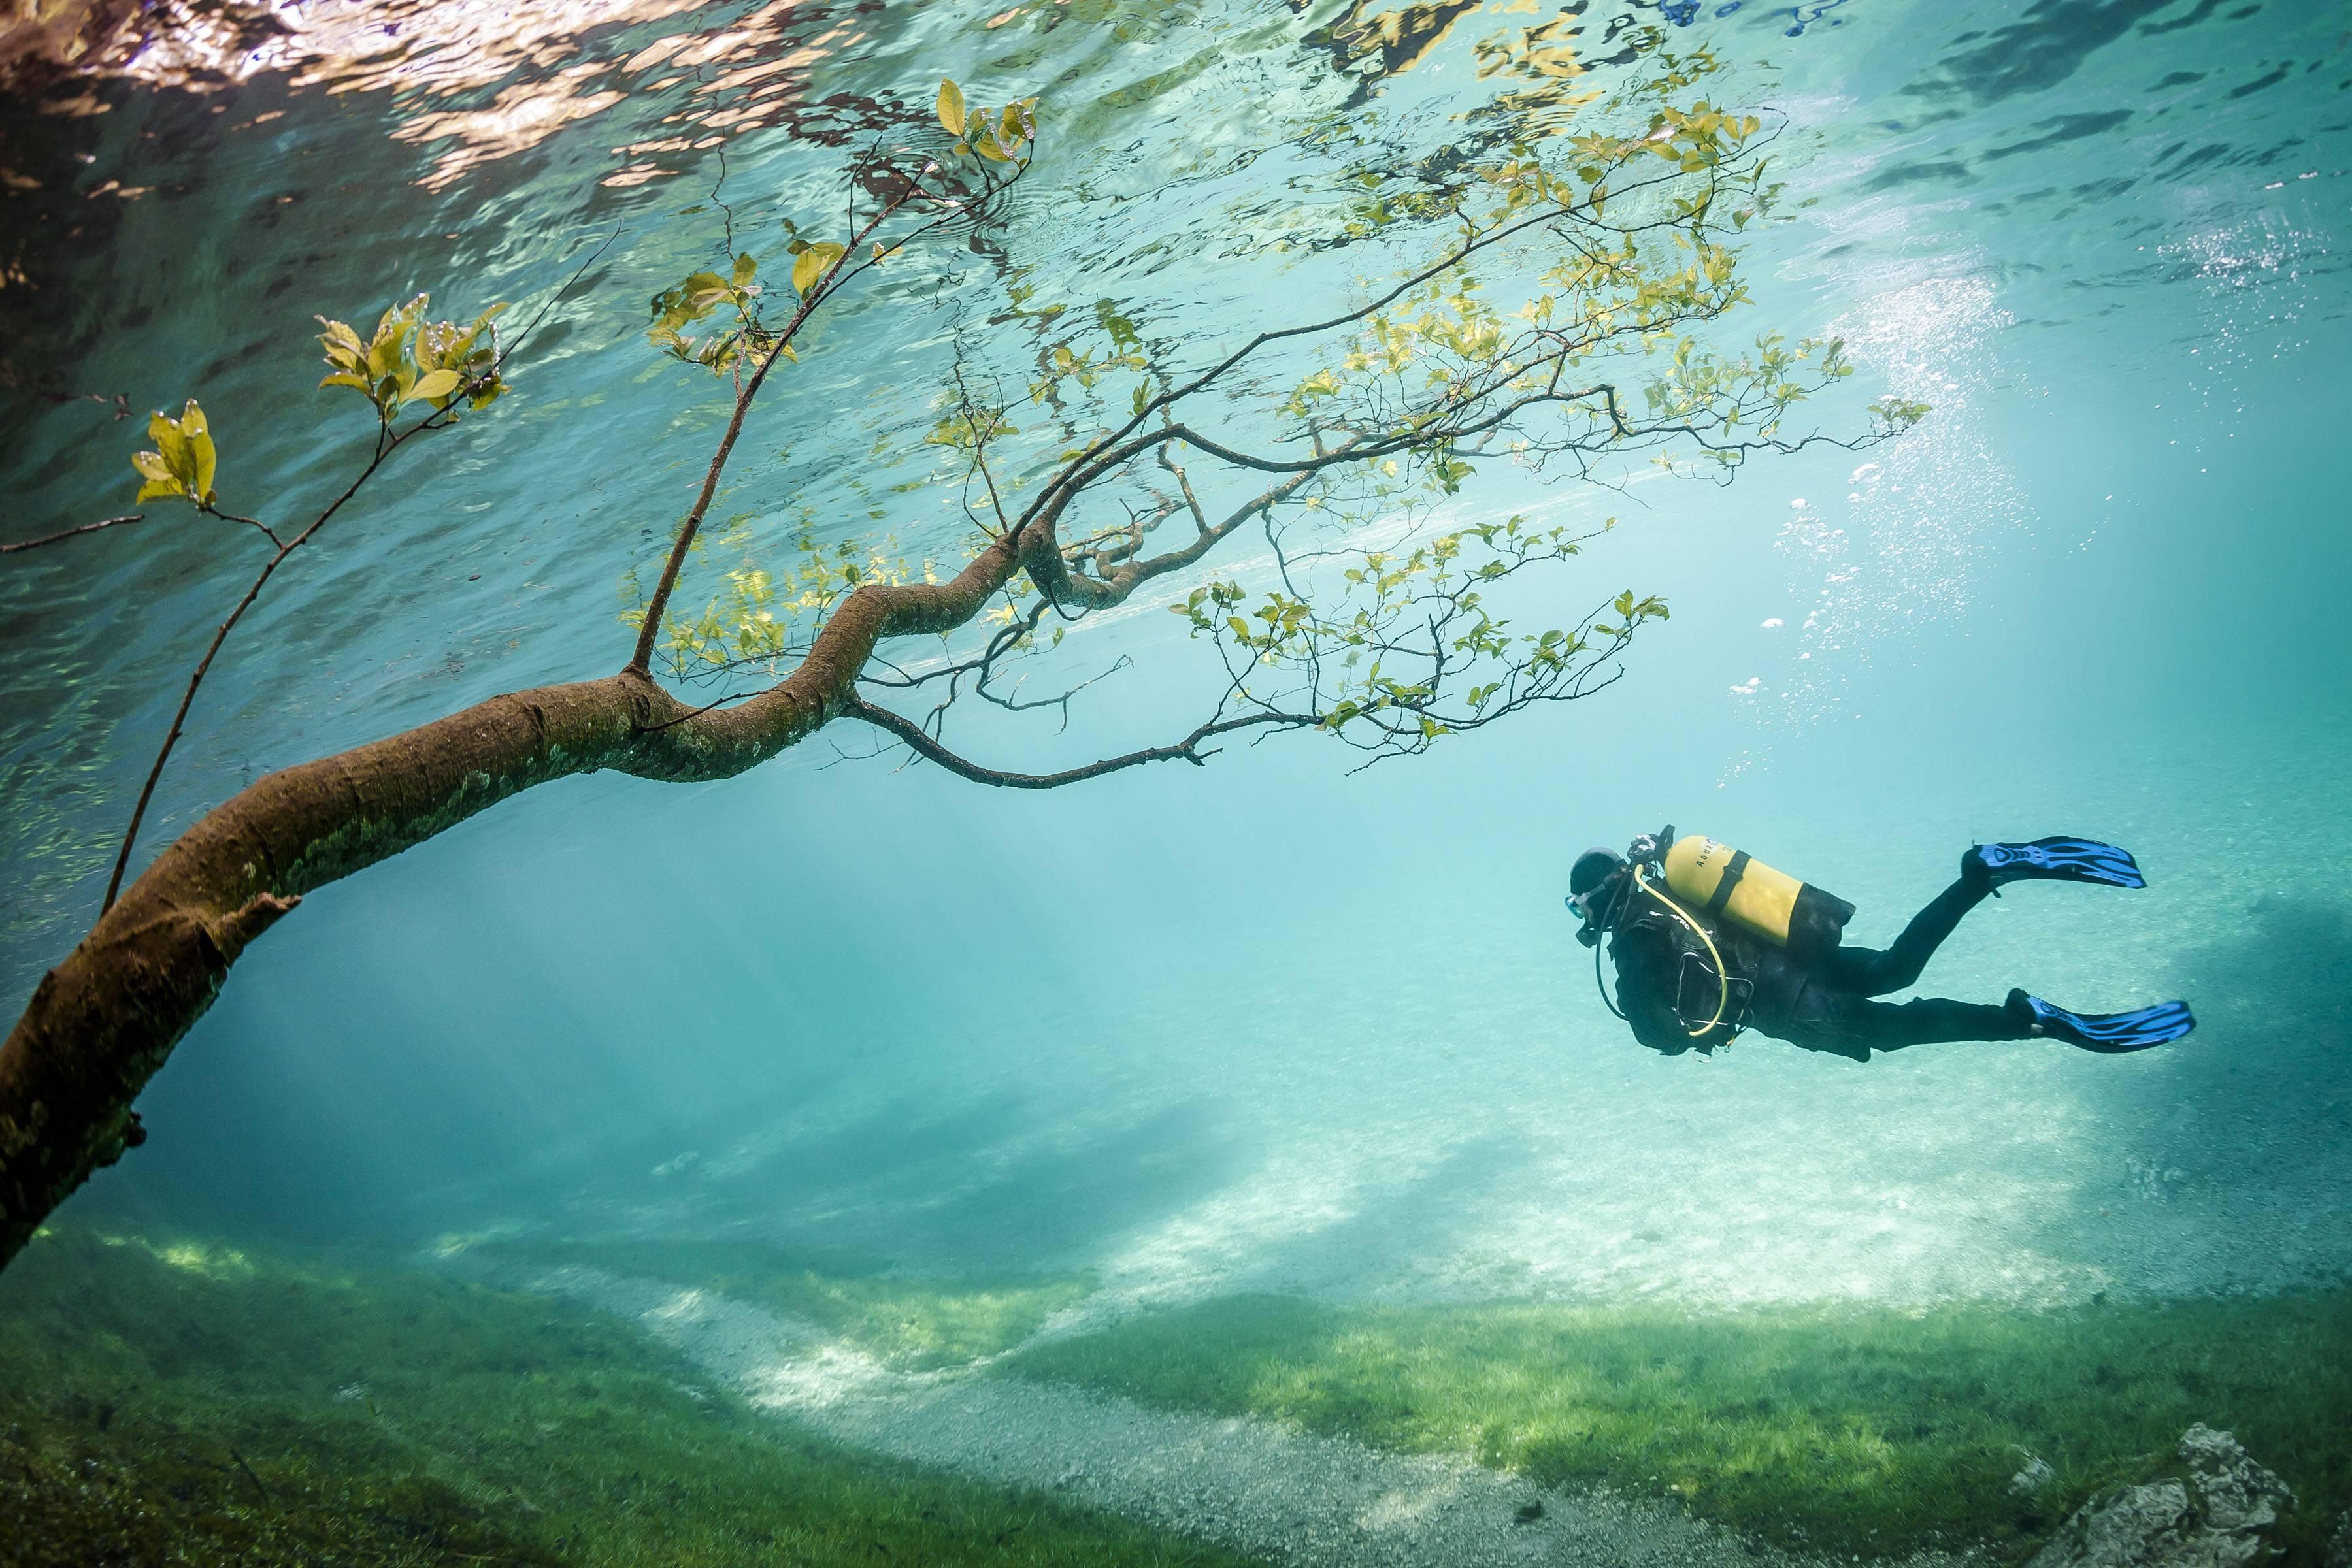 аквалангист, дайвер, креатив